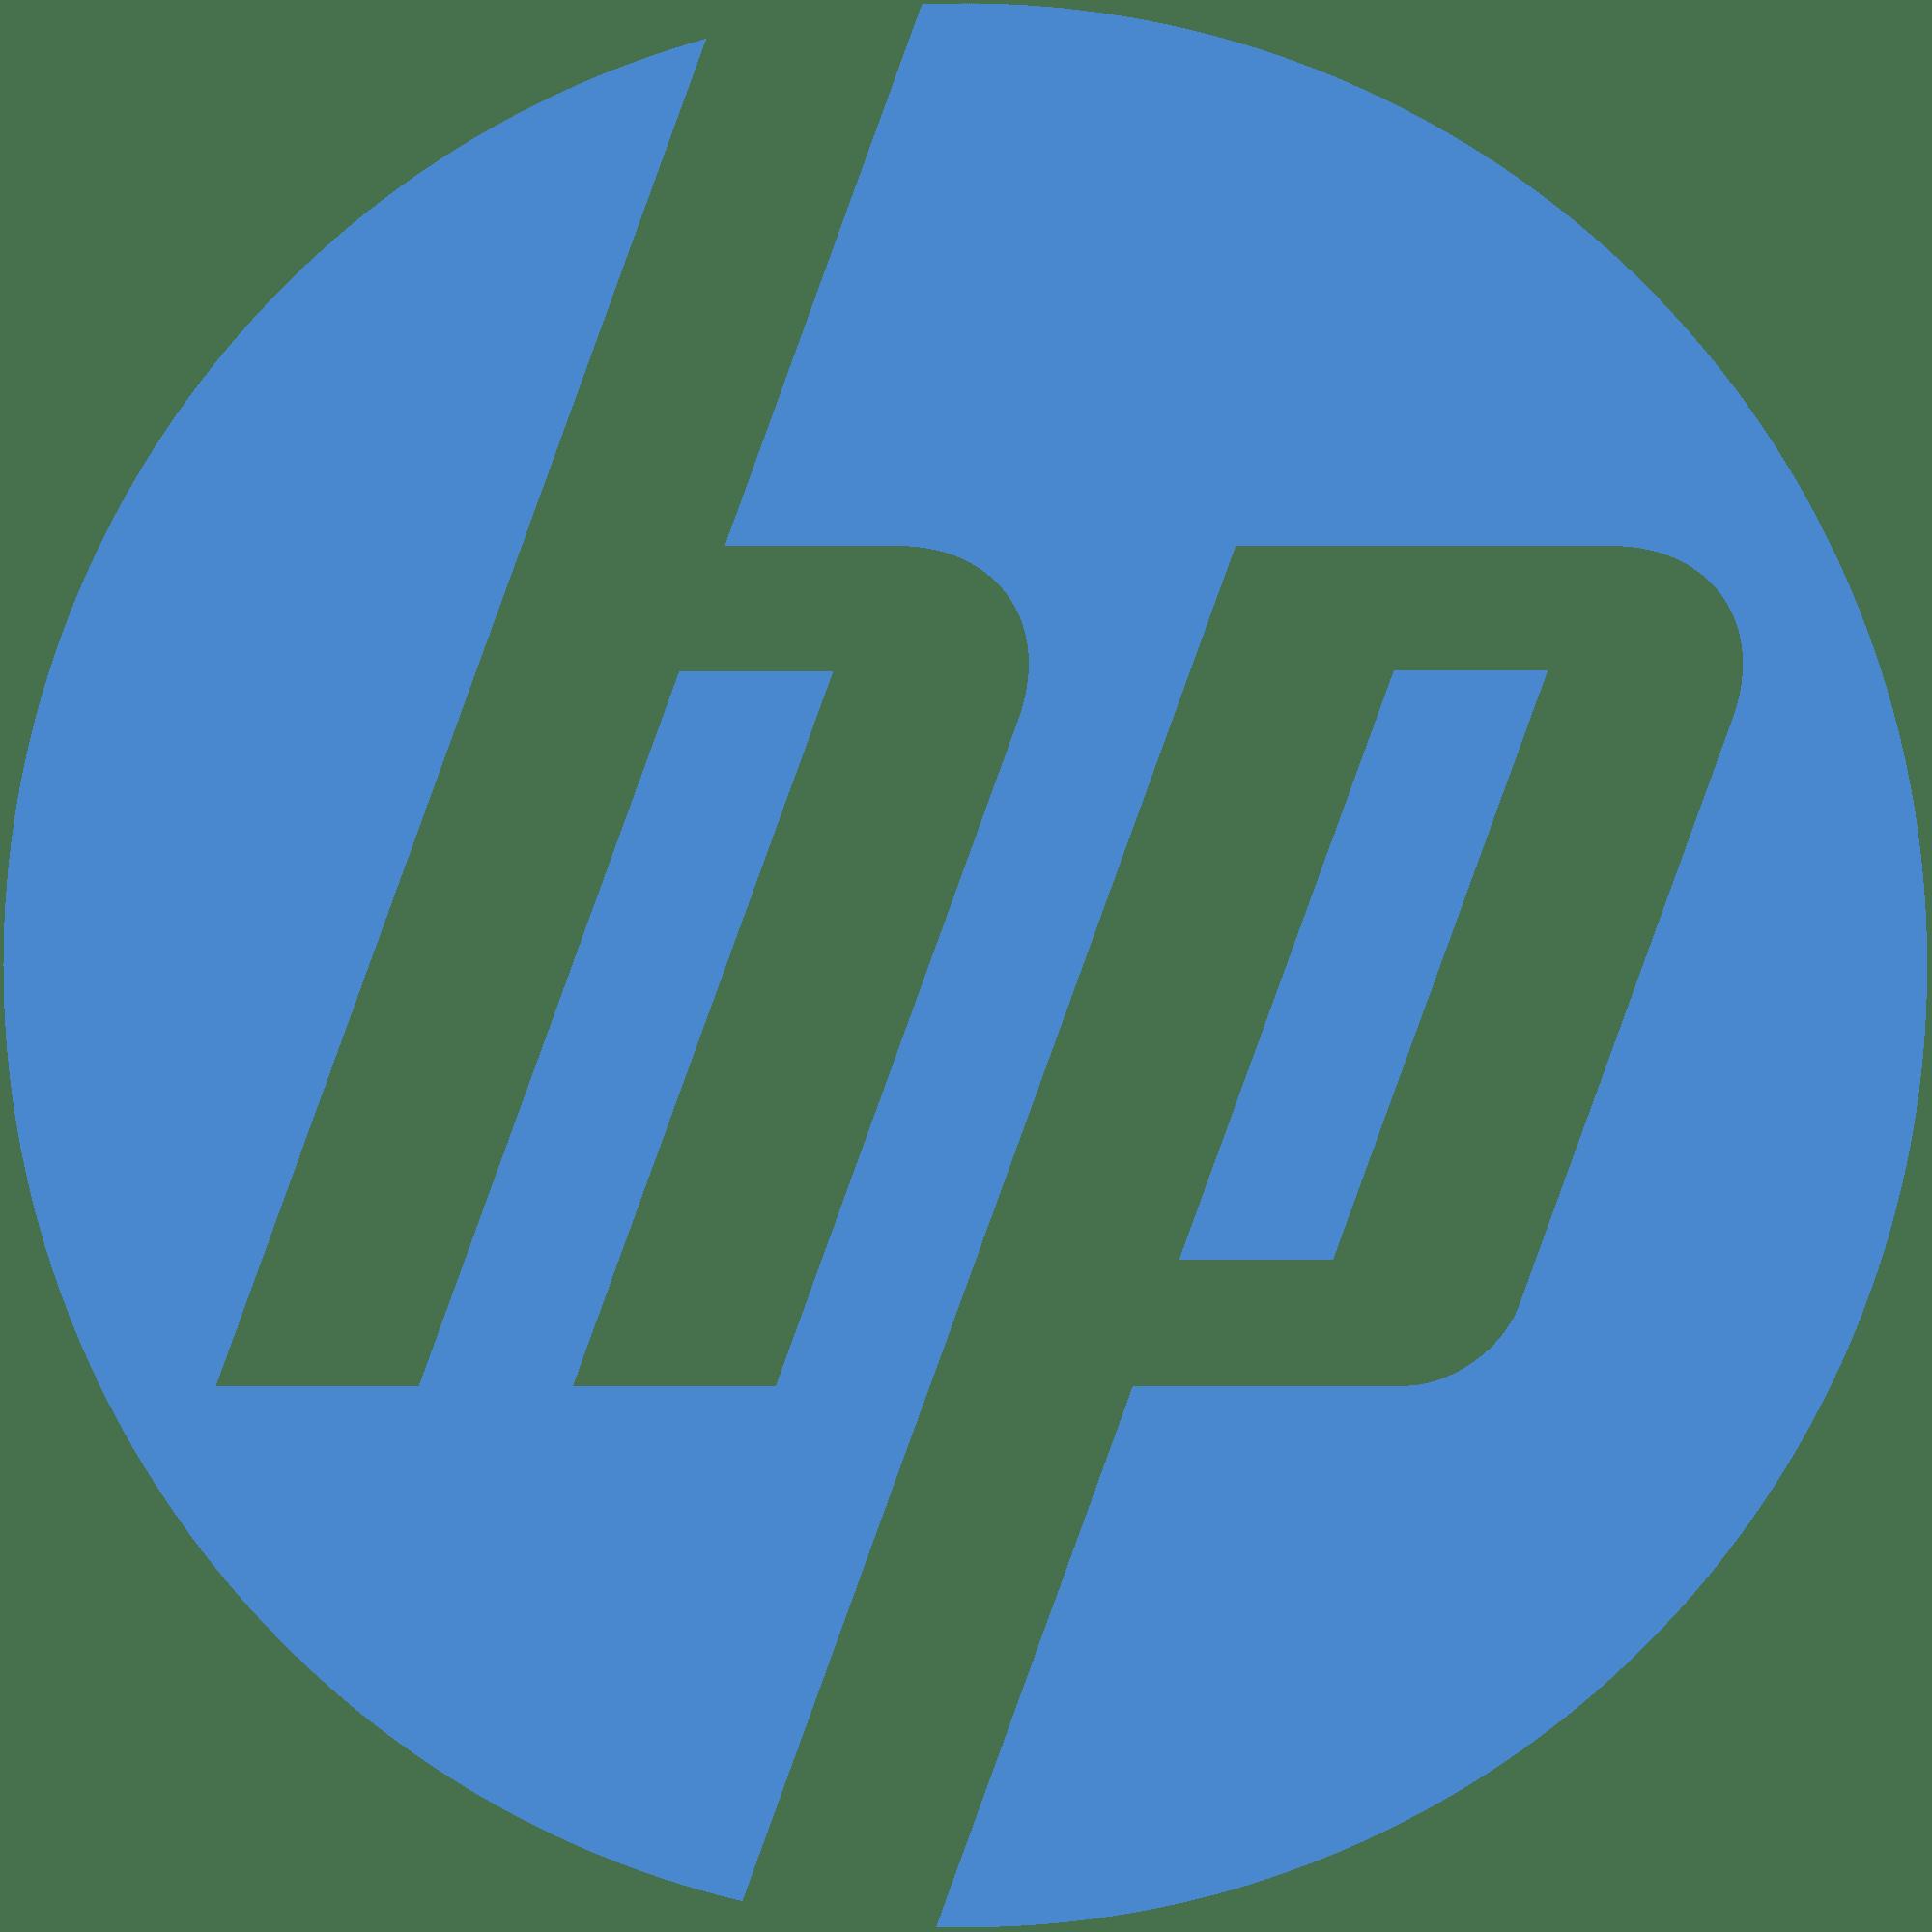 HP w2207 22 inch LCD Monitor drivers